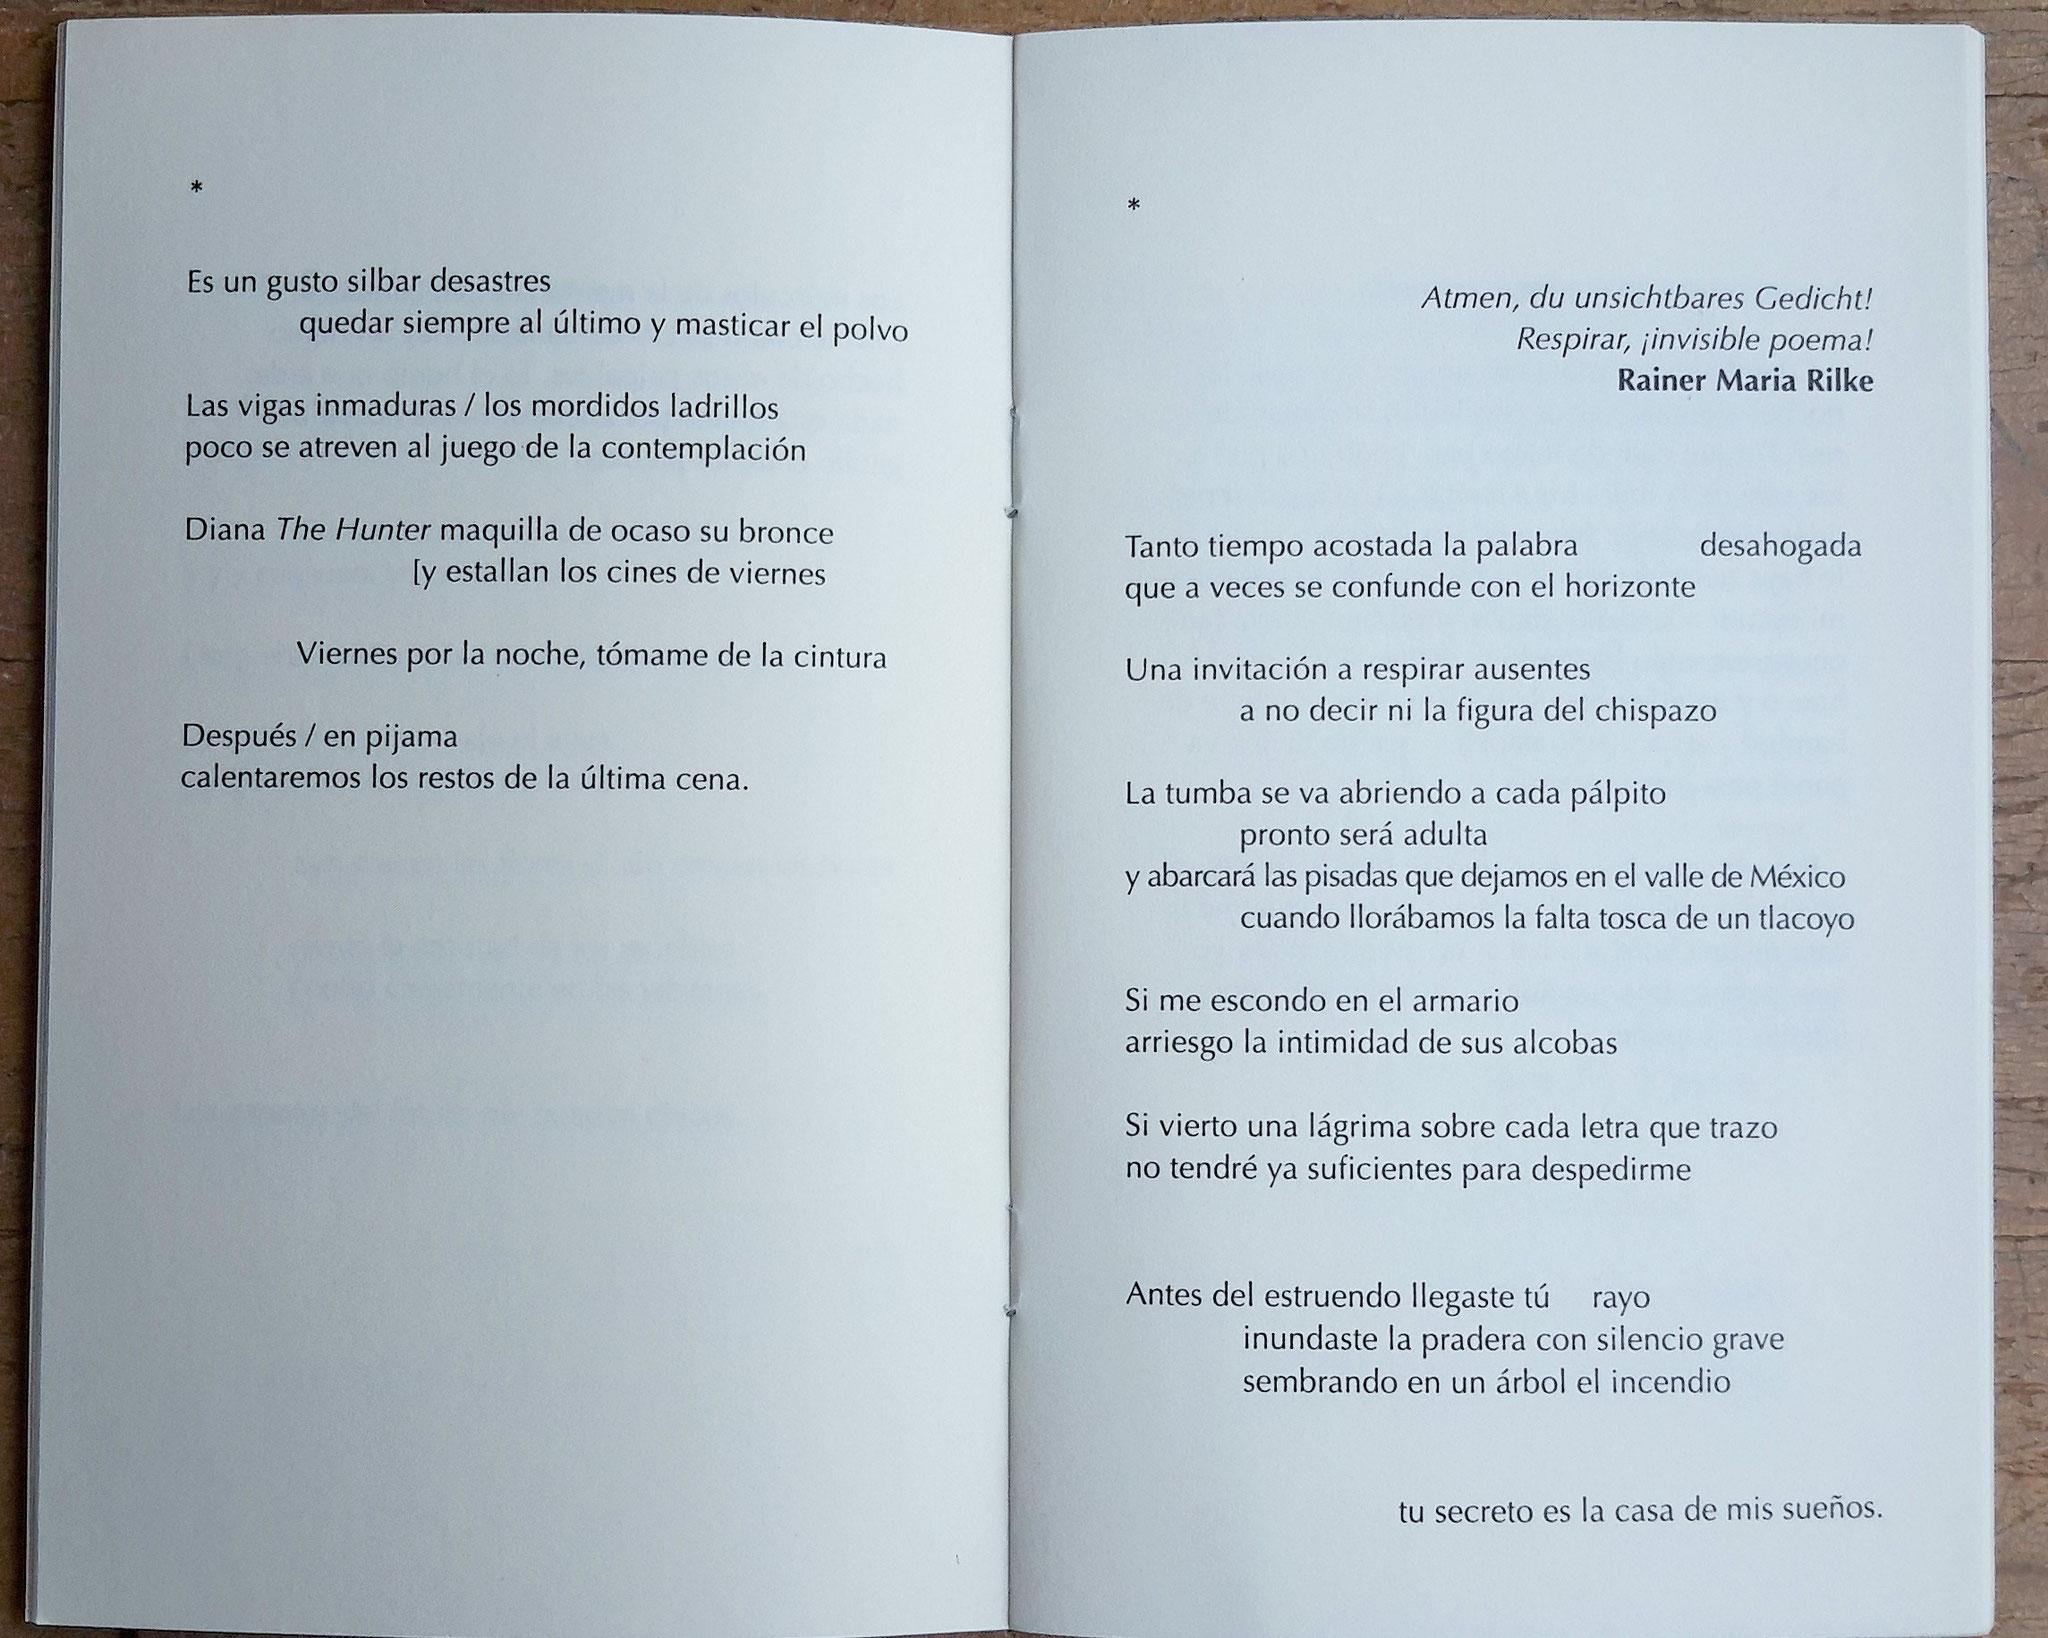 Poemas muy tarde / Bruno Dario